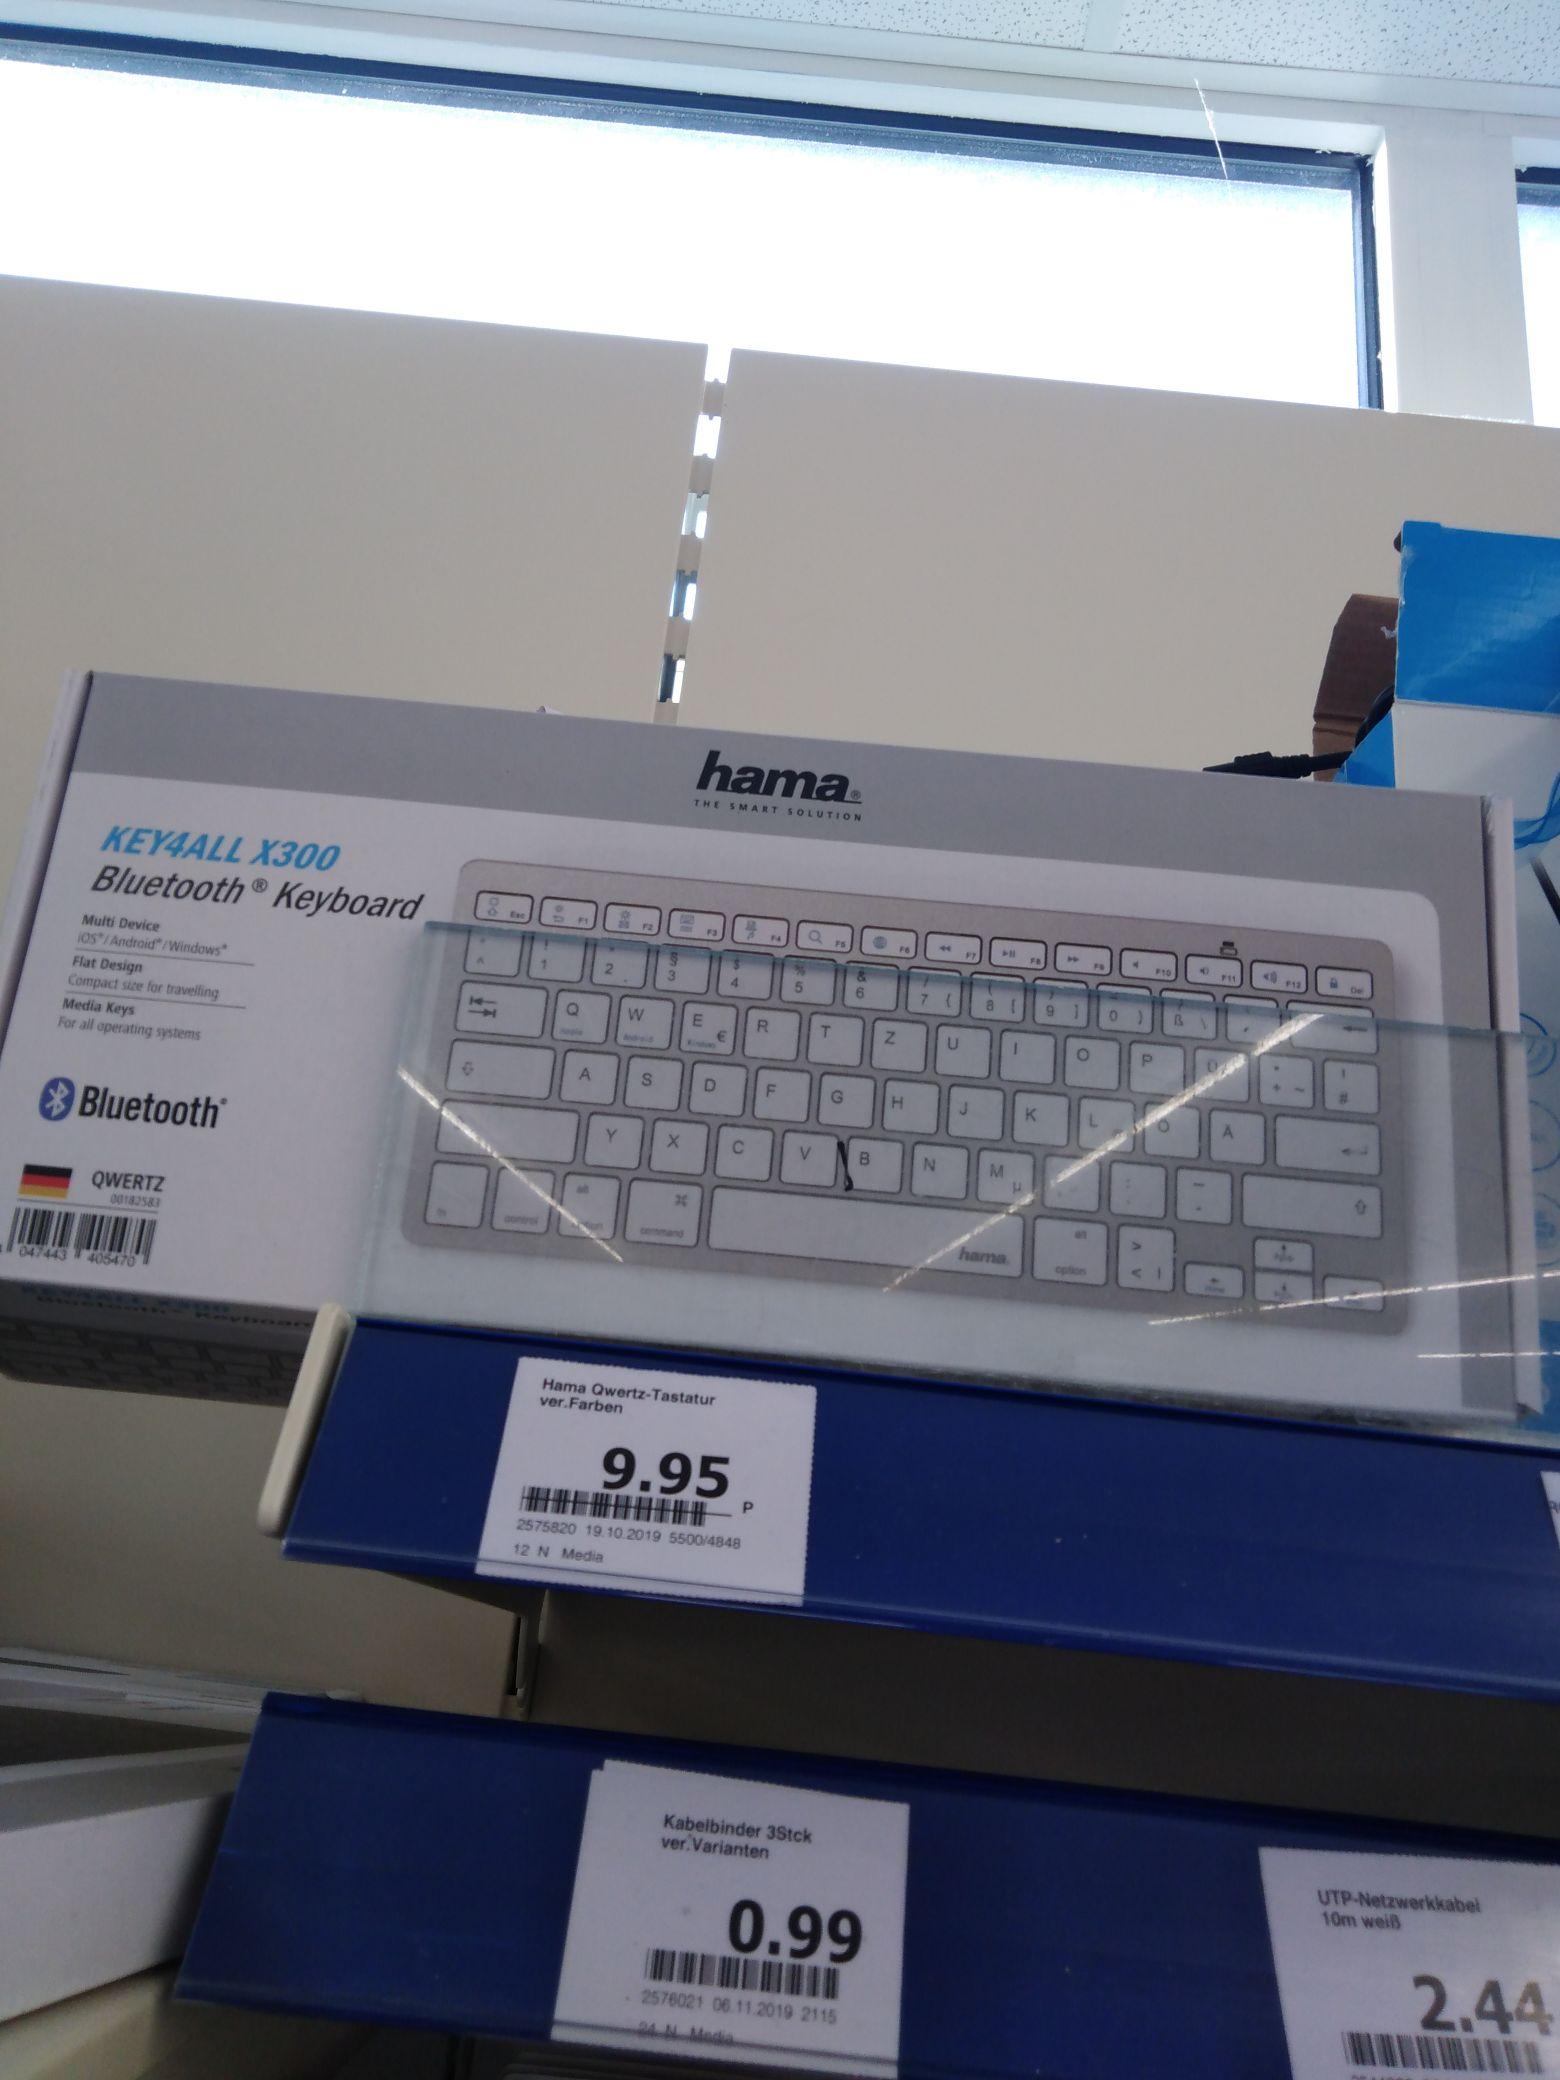 Hama Bluetooth Tastatur Key4All X300 - mydealz.de